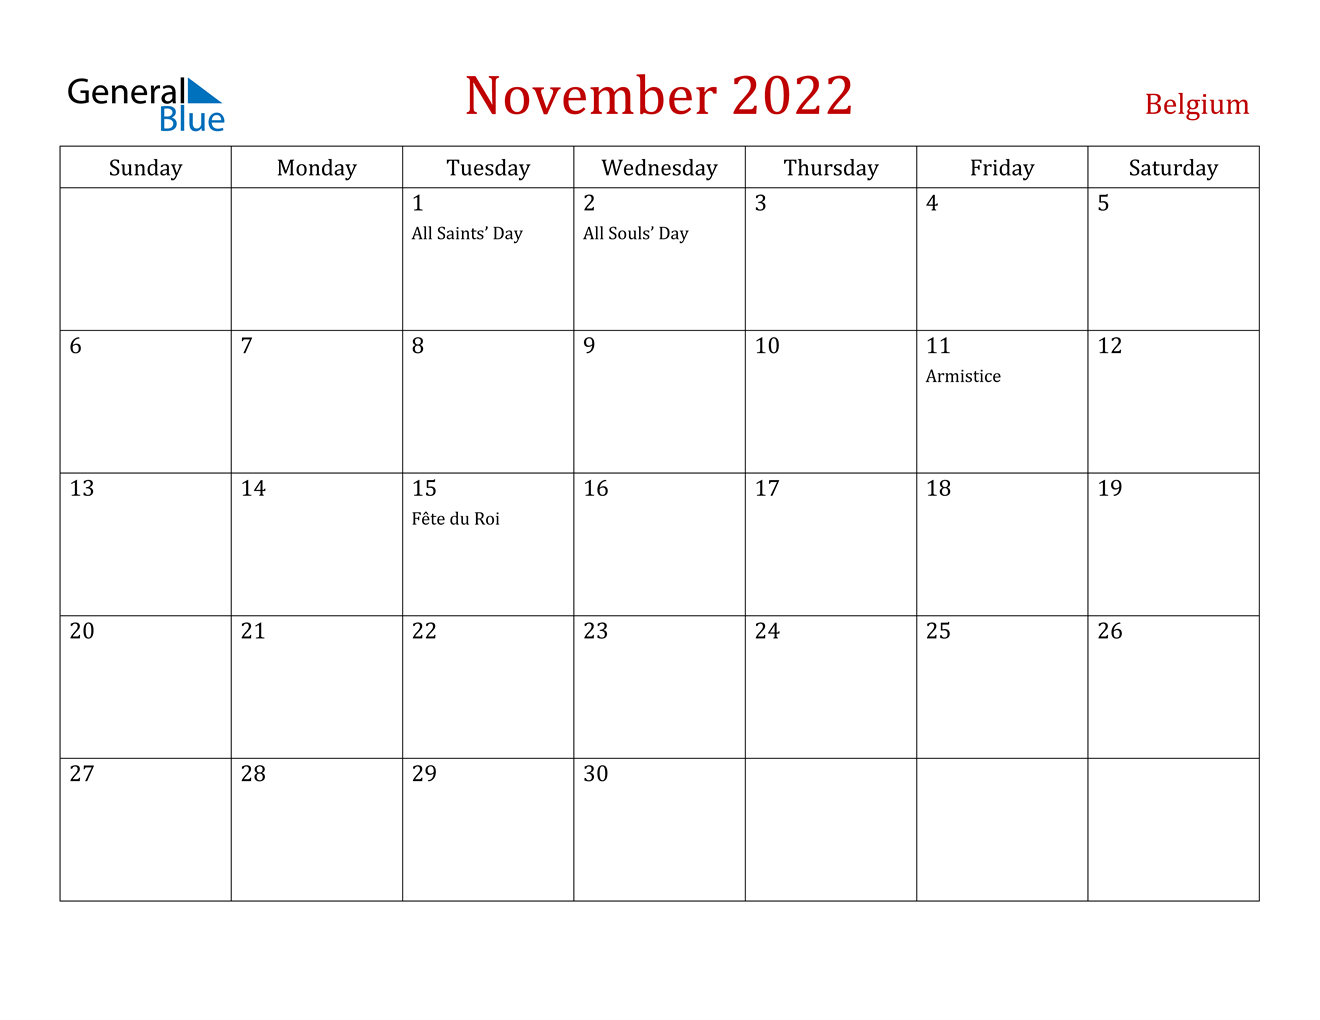 November 2022 Calendar - Belgium